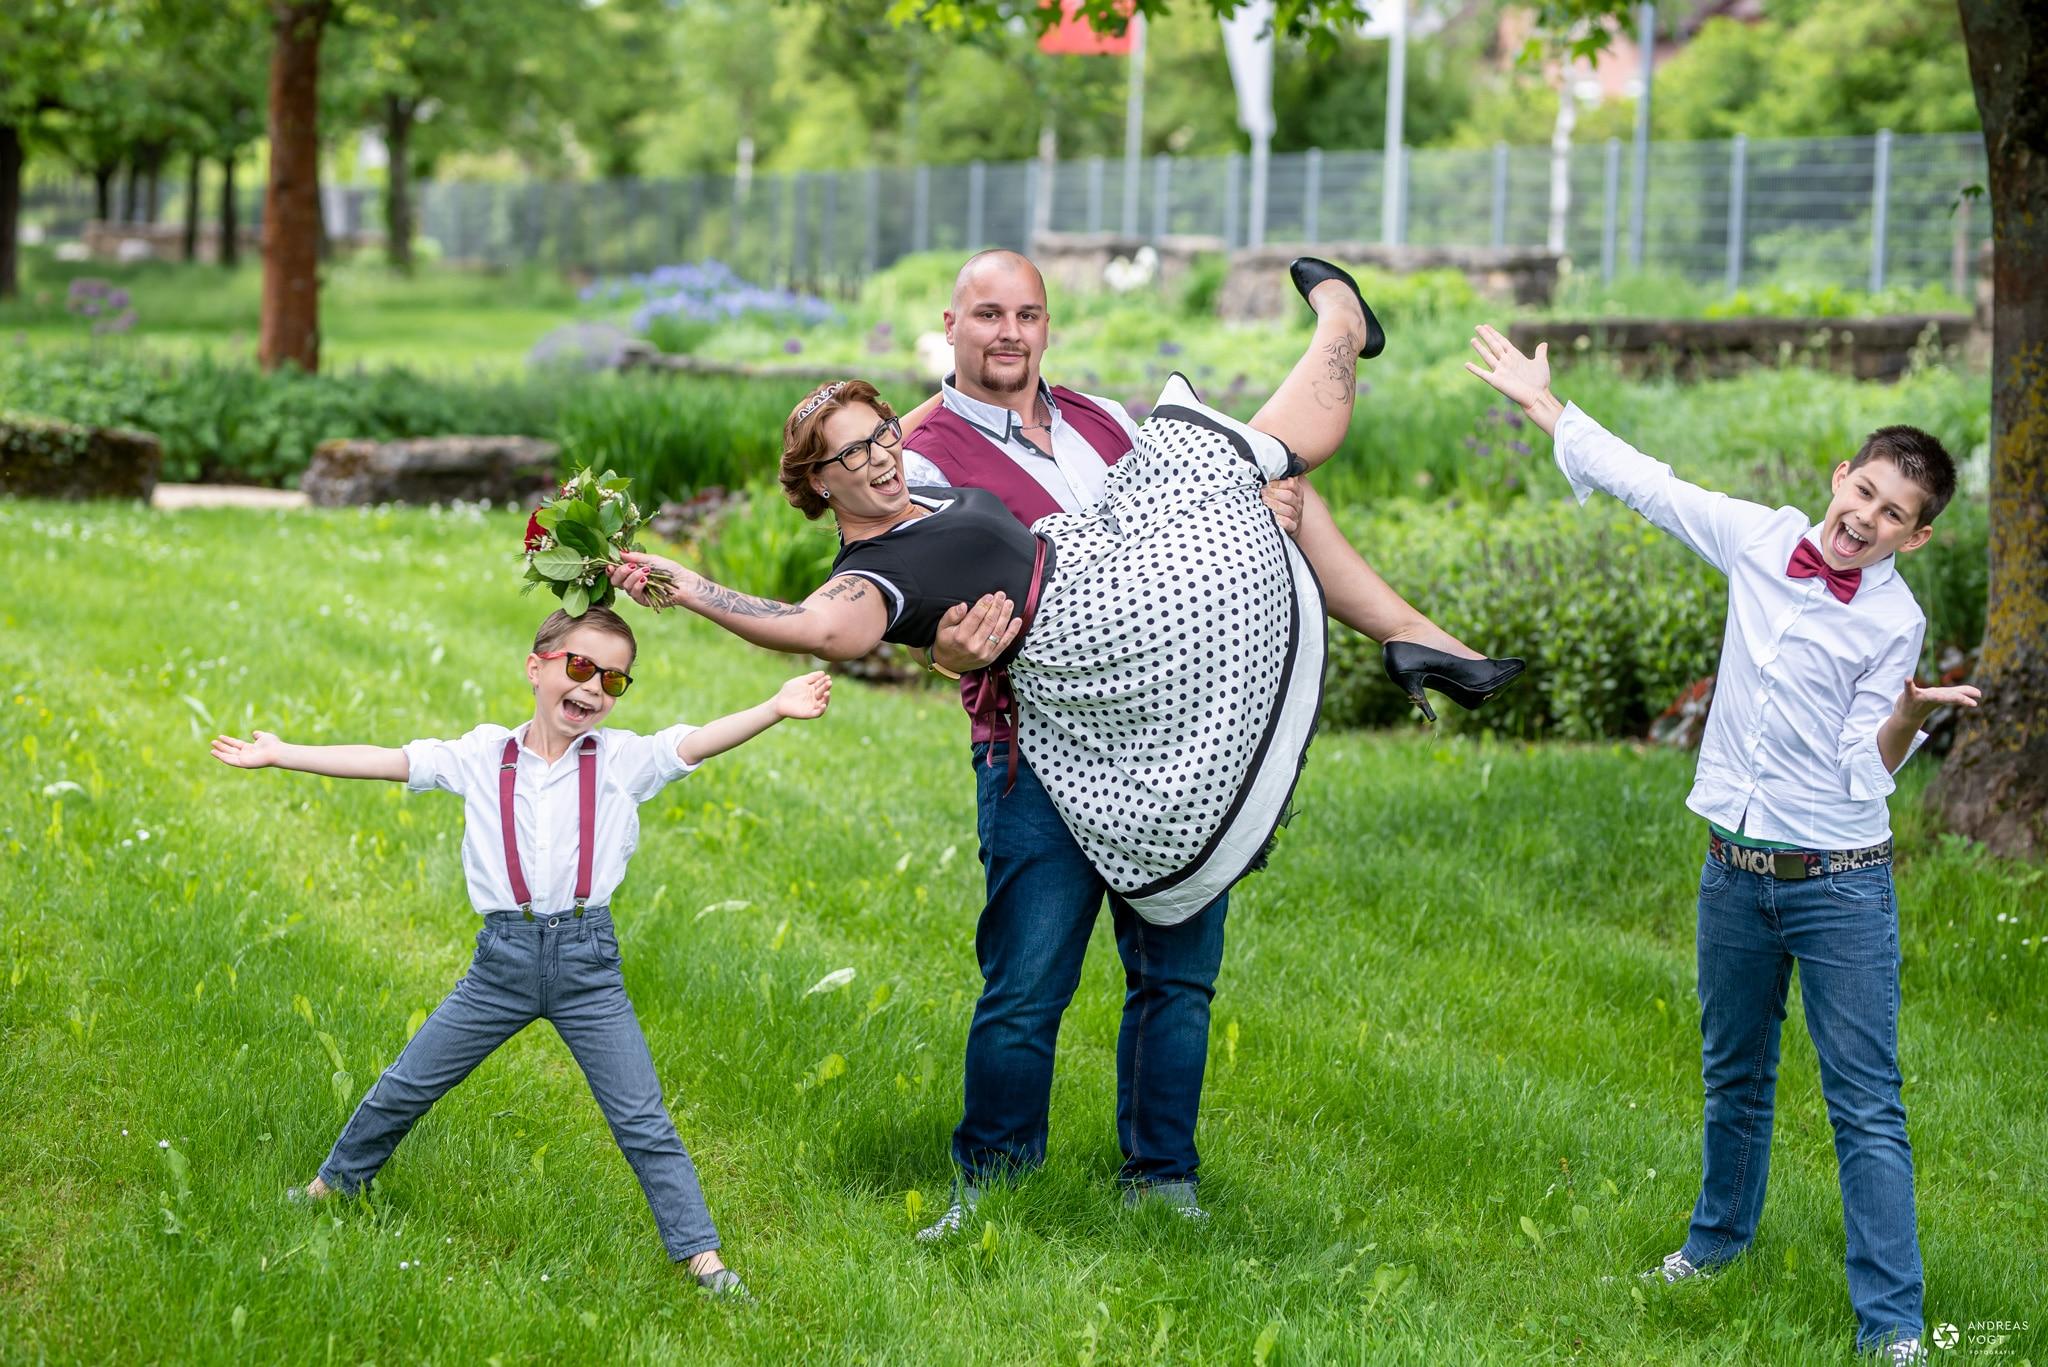 familienfotos-heidenheim-andreas-vogt-fotografie